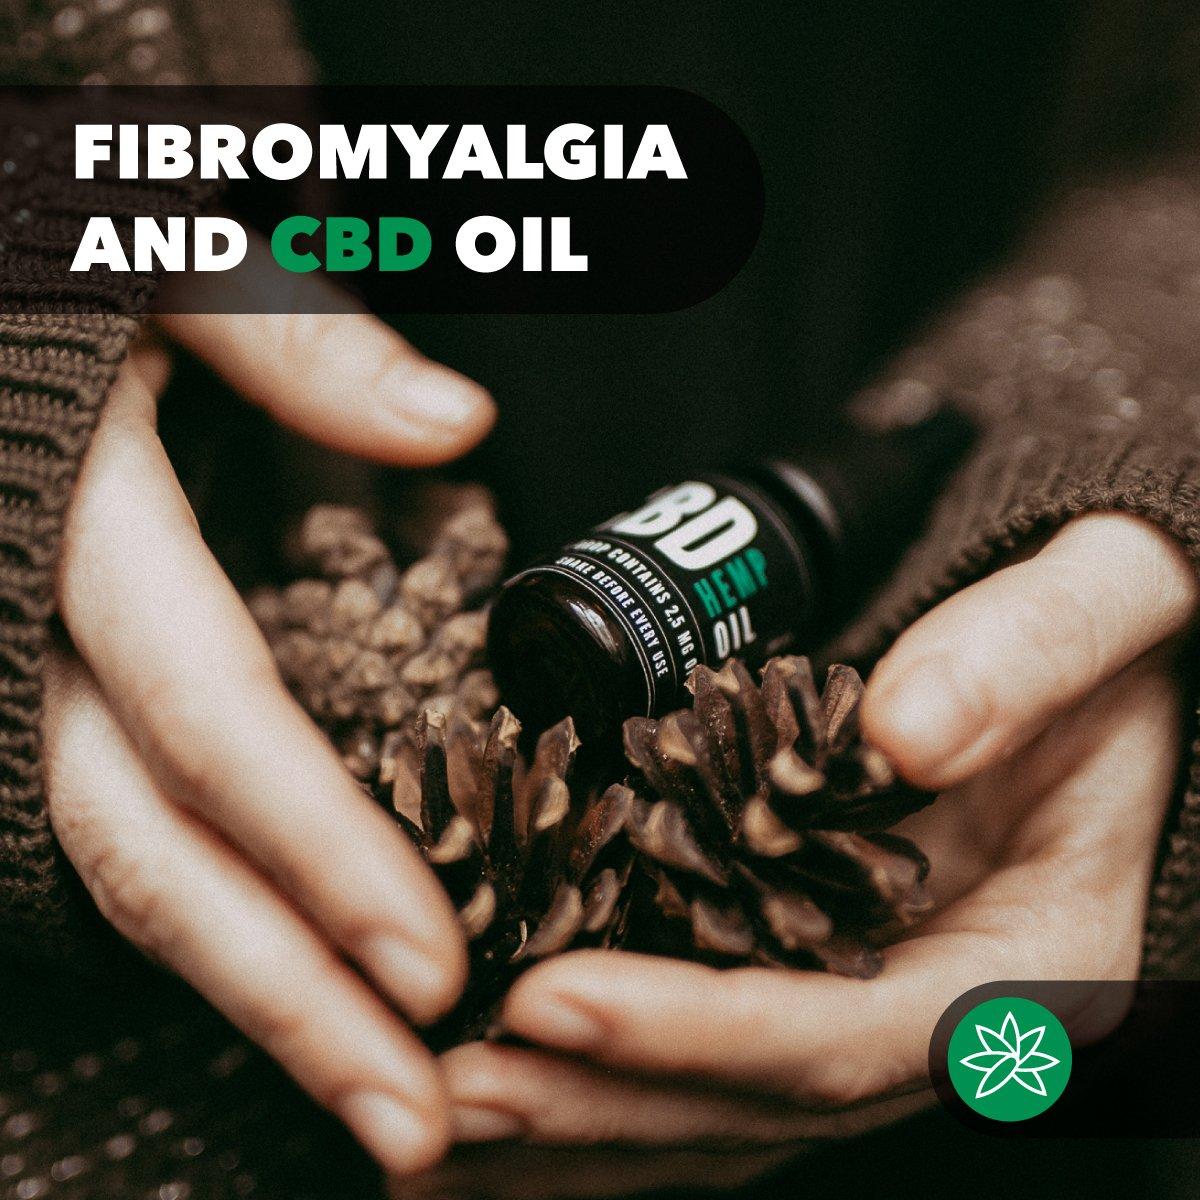 Fibromyalgia and CBD oil